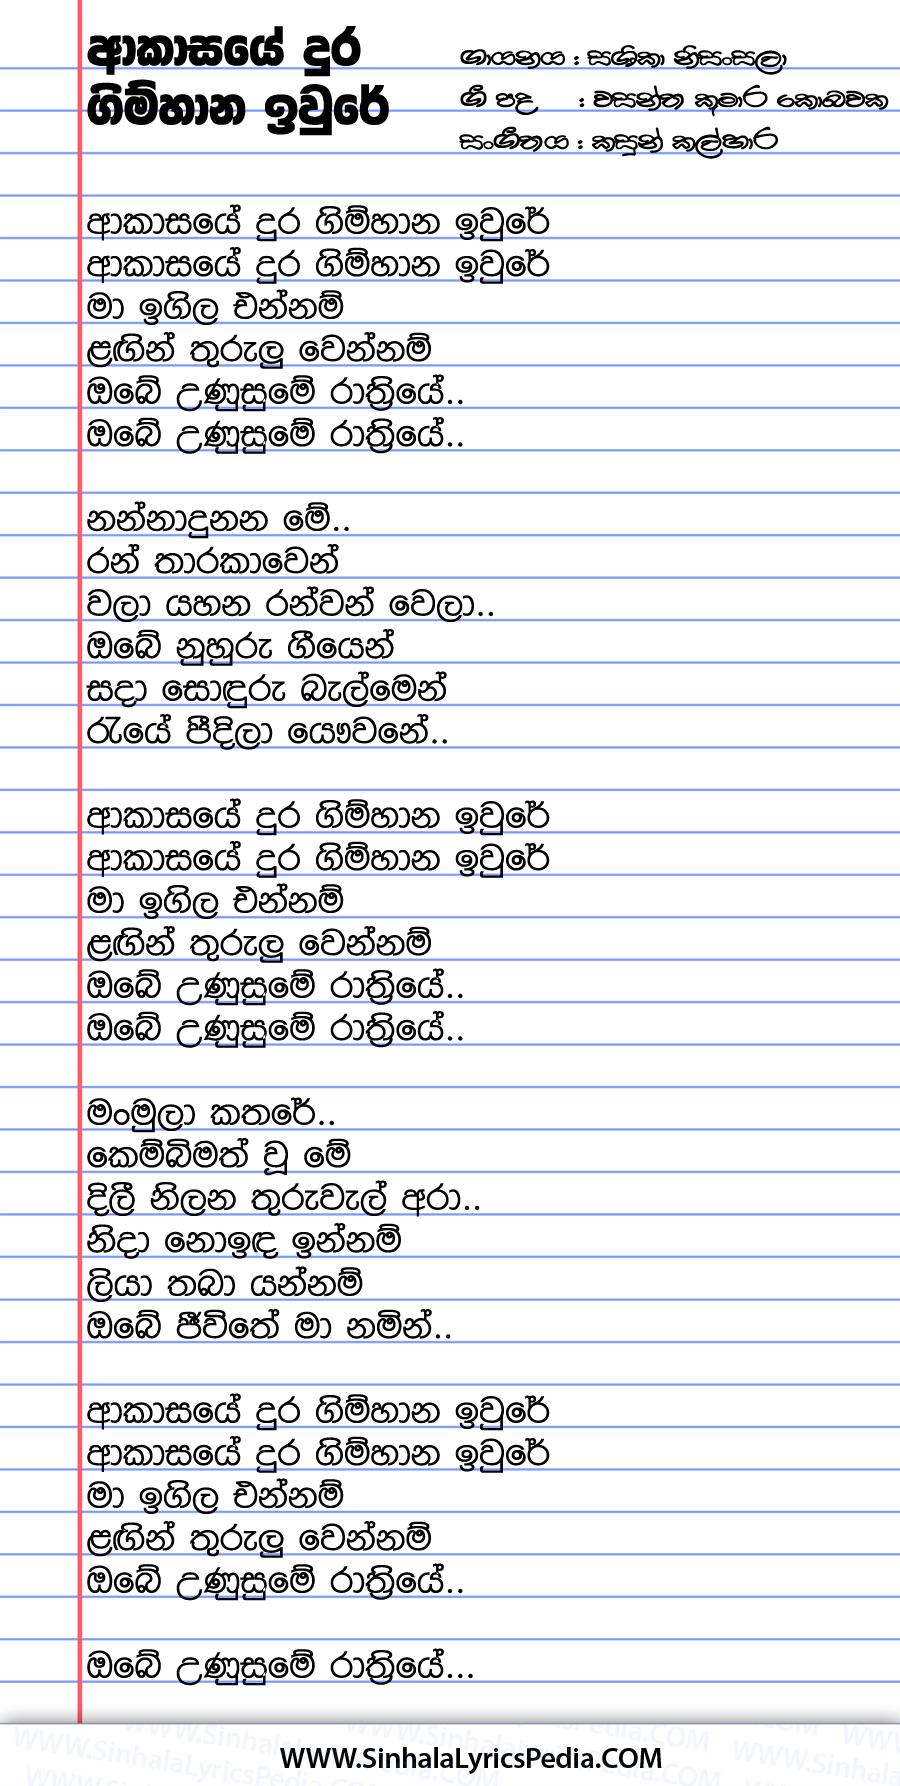 Akasaye Dura Gimhana Iwure Song Lyrics